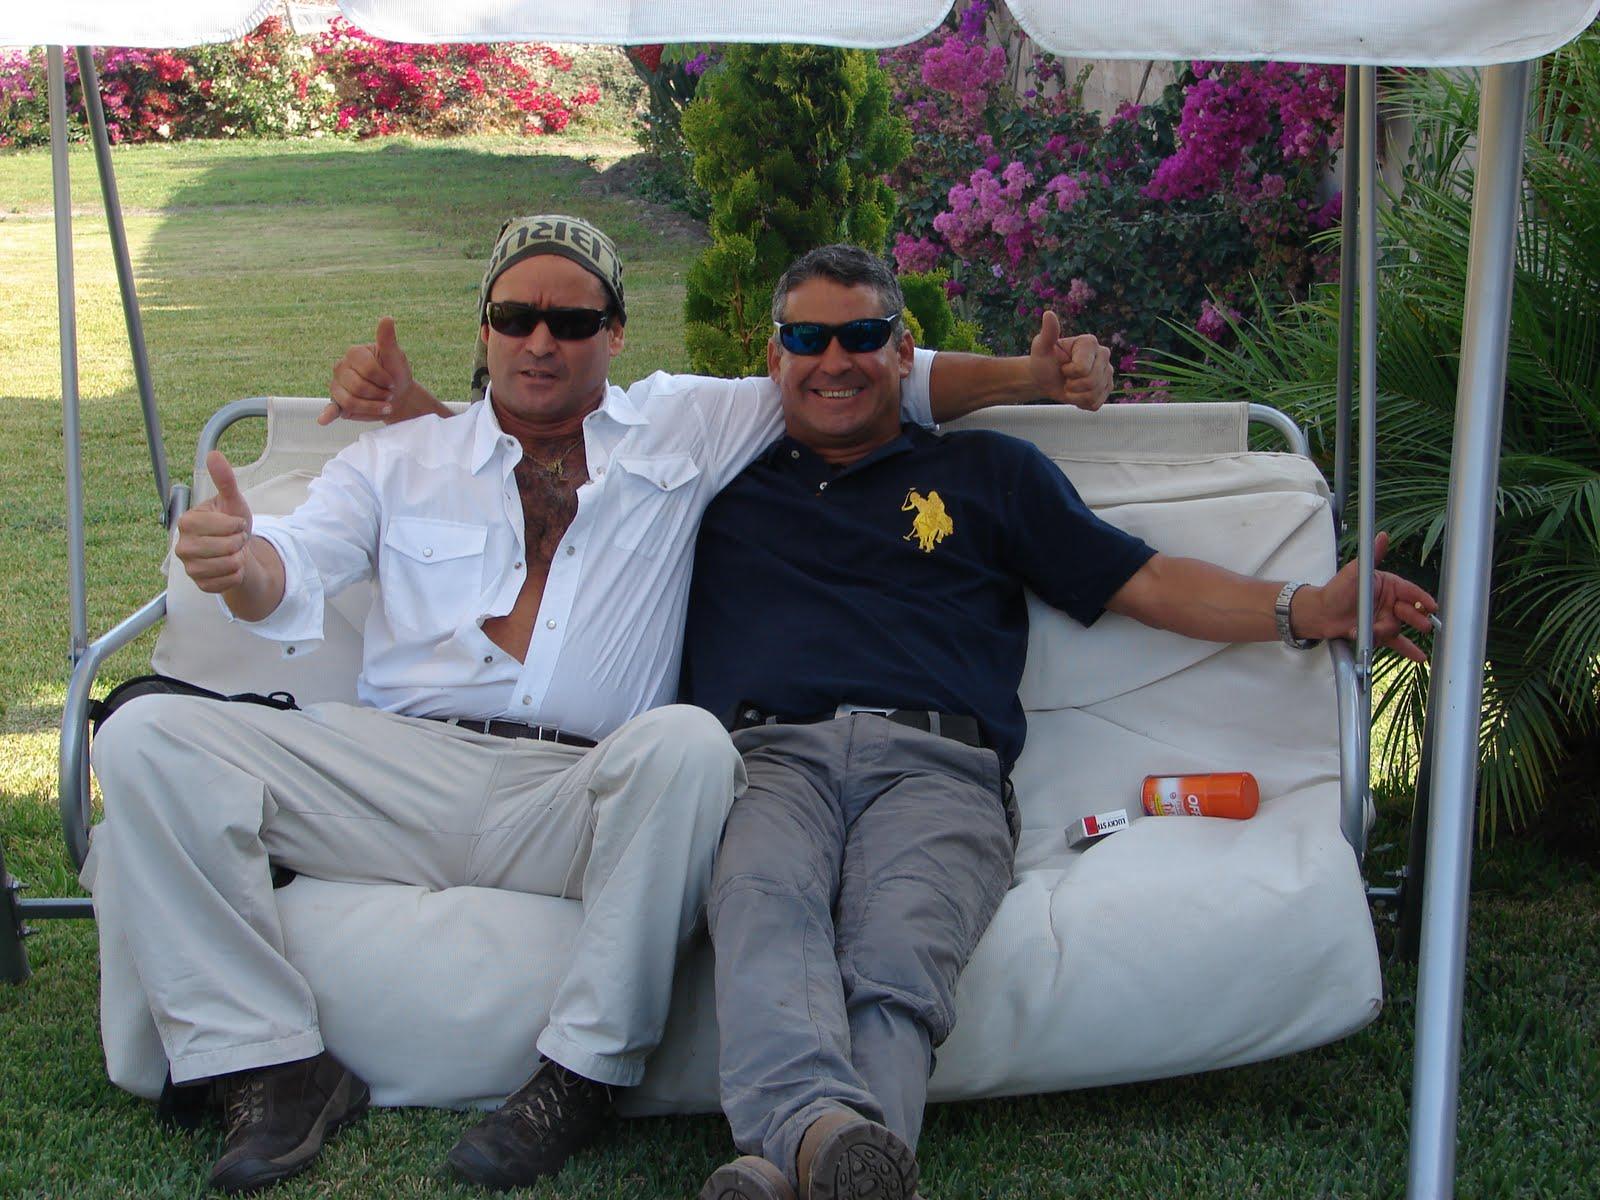 23-mayo-22-21-24-25-26-27...2011...Fito y Gonzalo Trujillo Diaz en NEW pics sec...